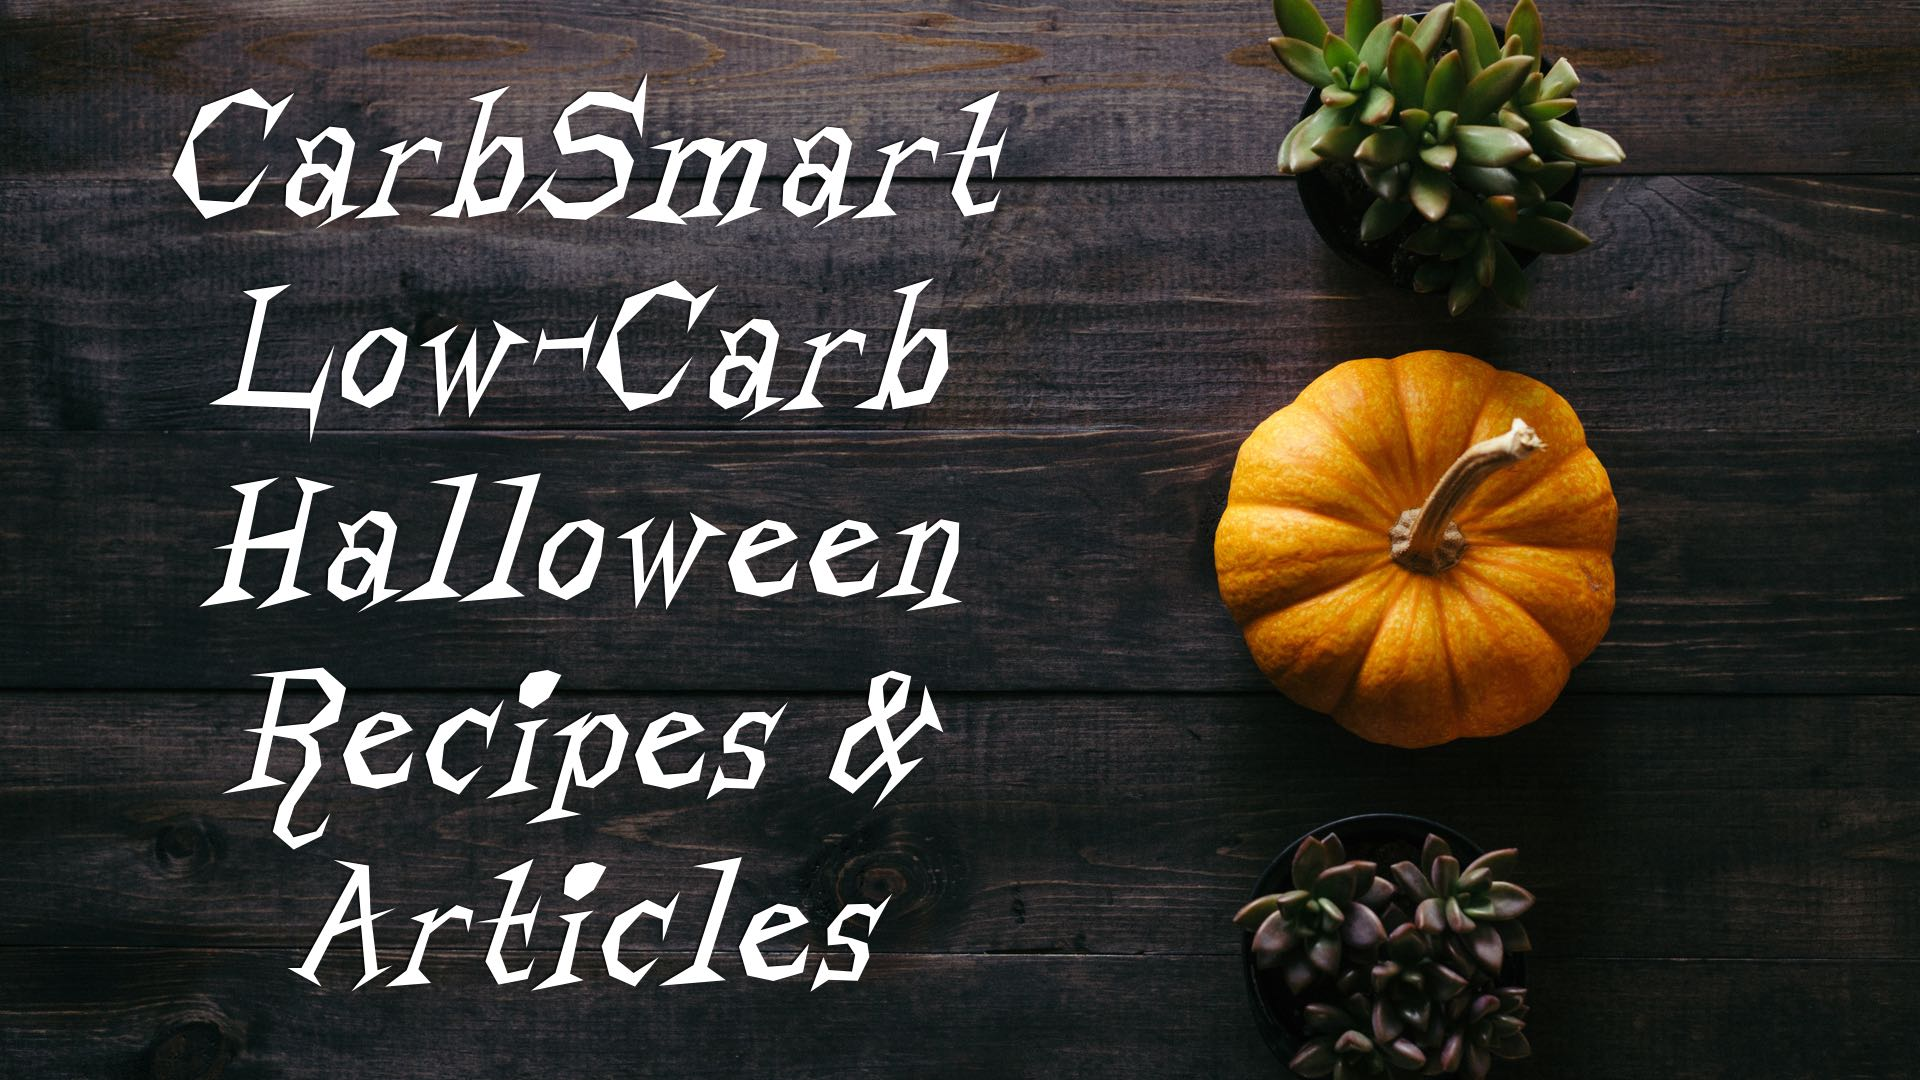 CarbSmart Low-Carb Halloween Recipes & Articles